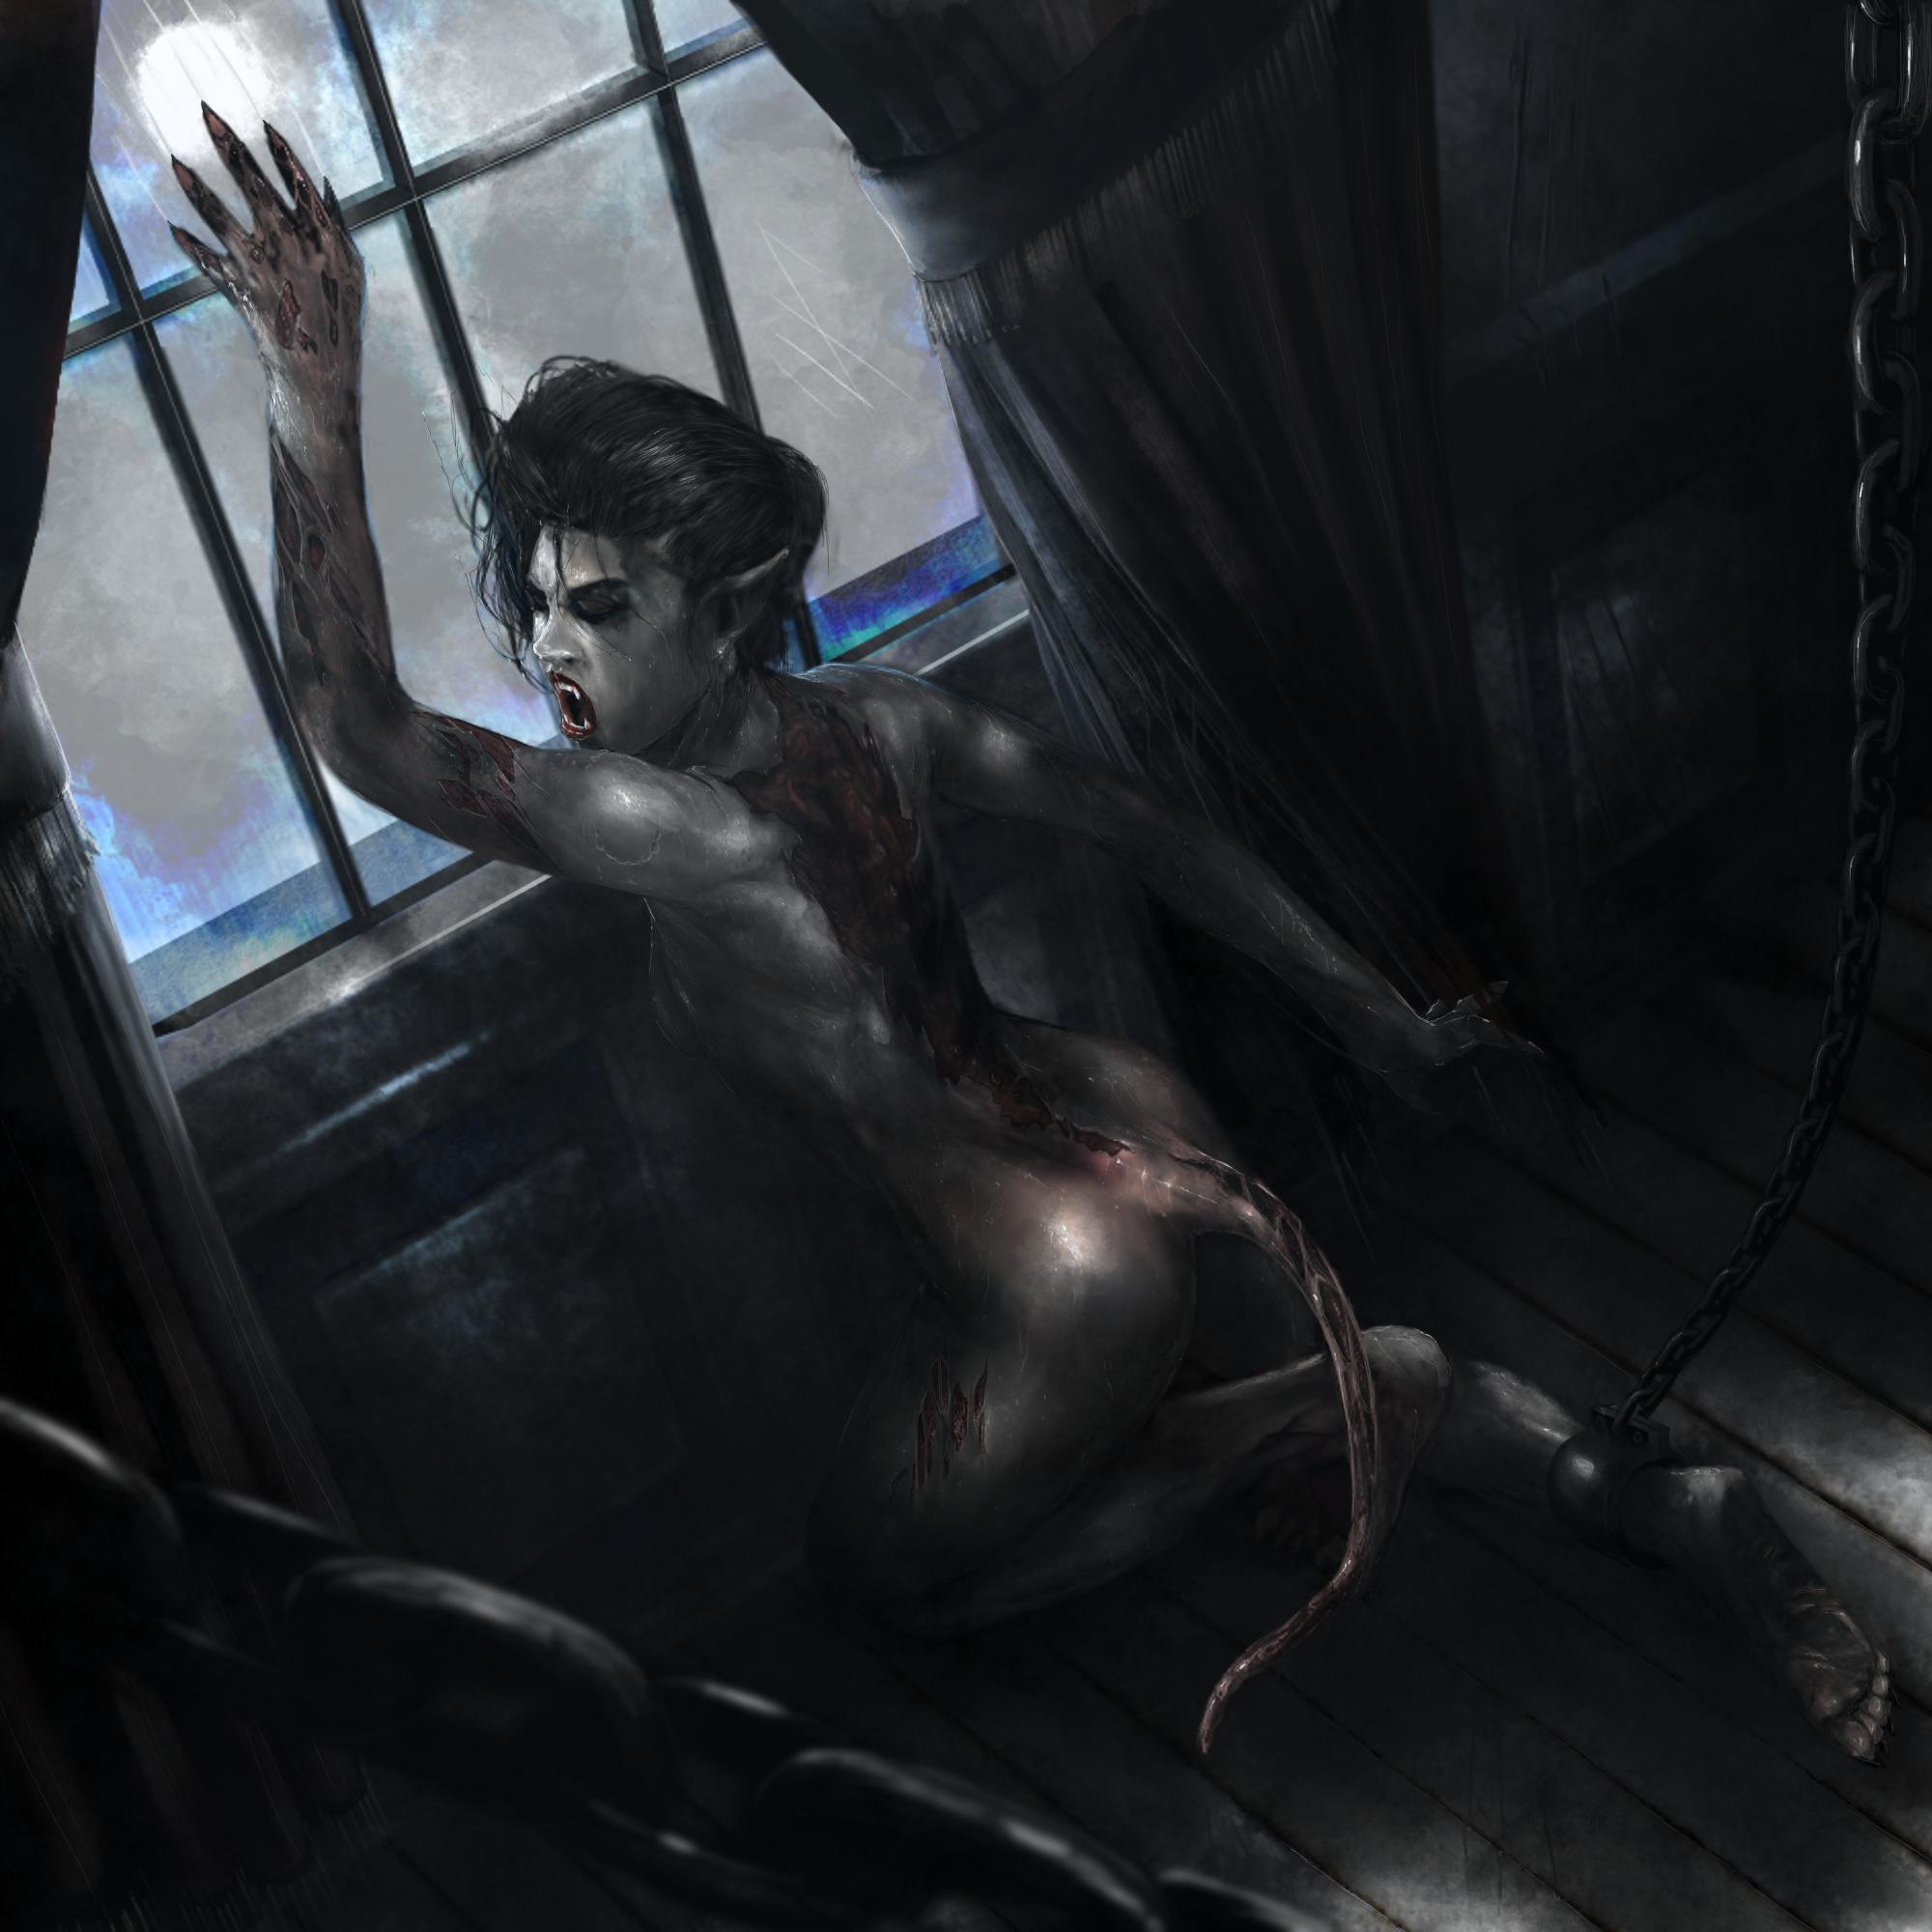 Skinwalker by thatDMan on DeviantArt